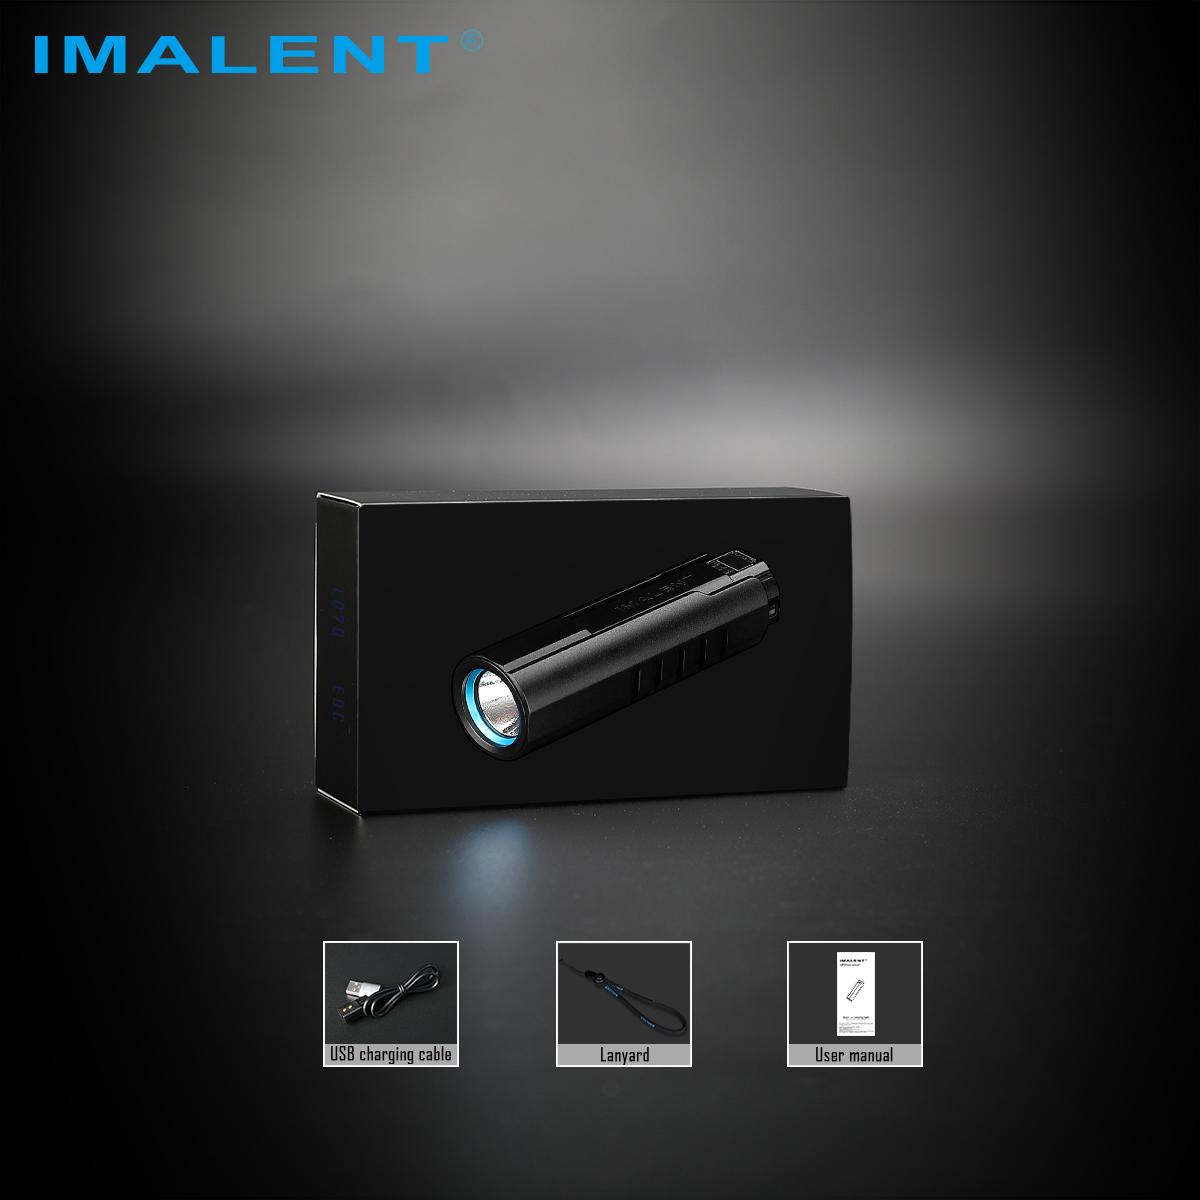 Imalent LD70 4000 Lumens Rechargeable LED Flashlight - Black